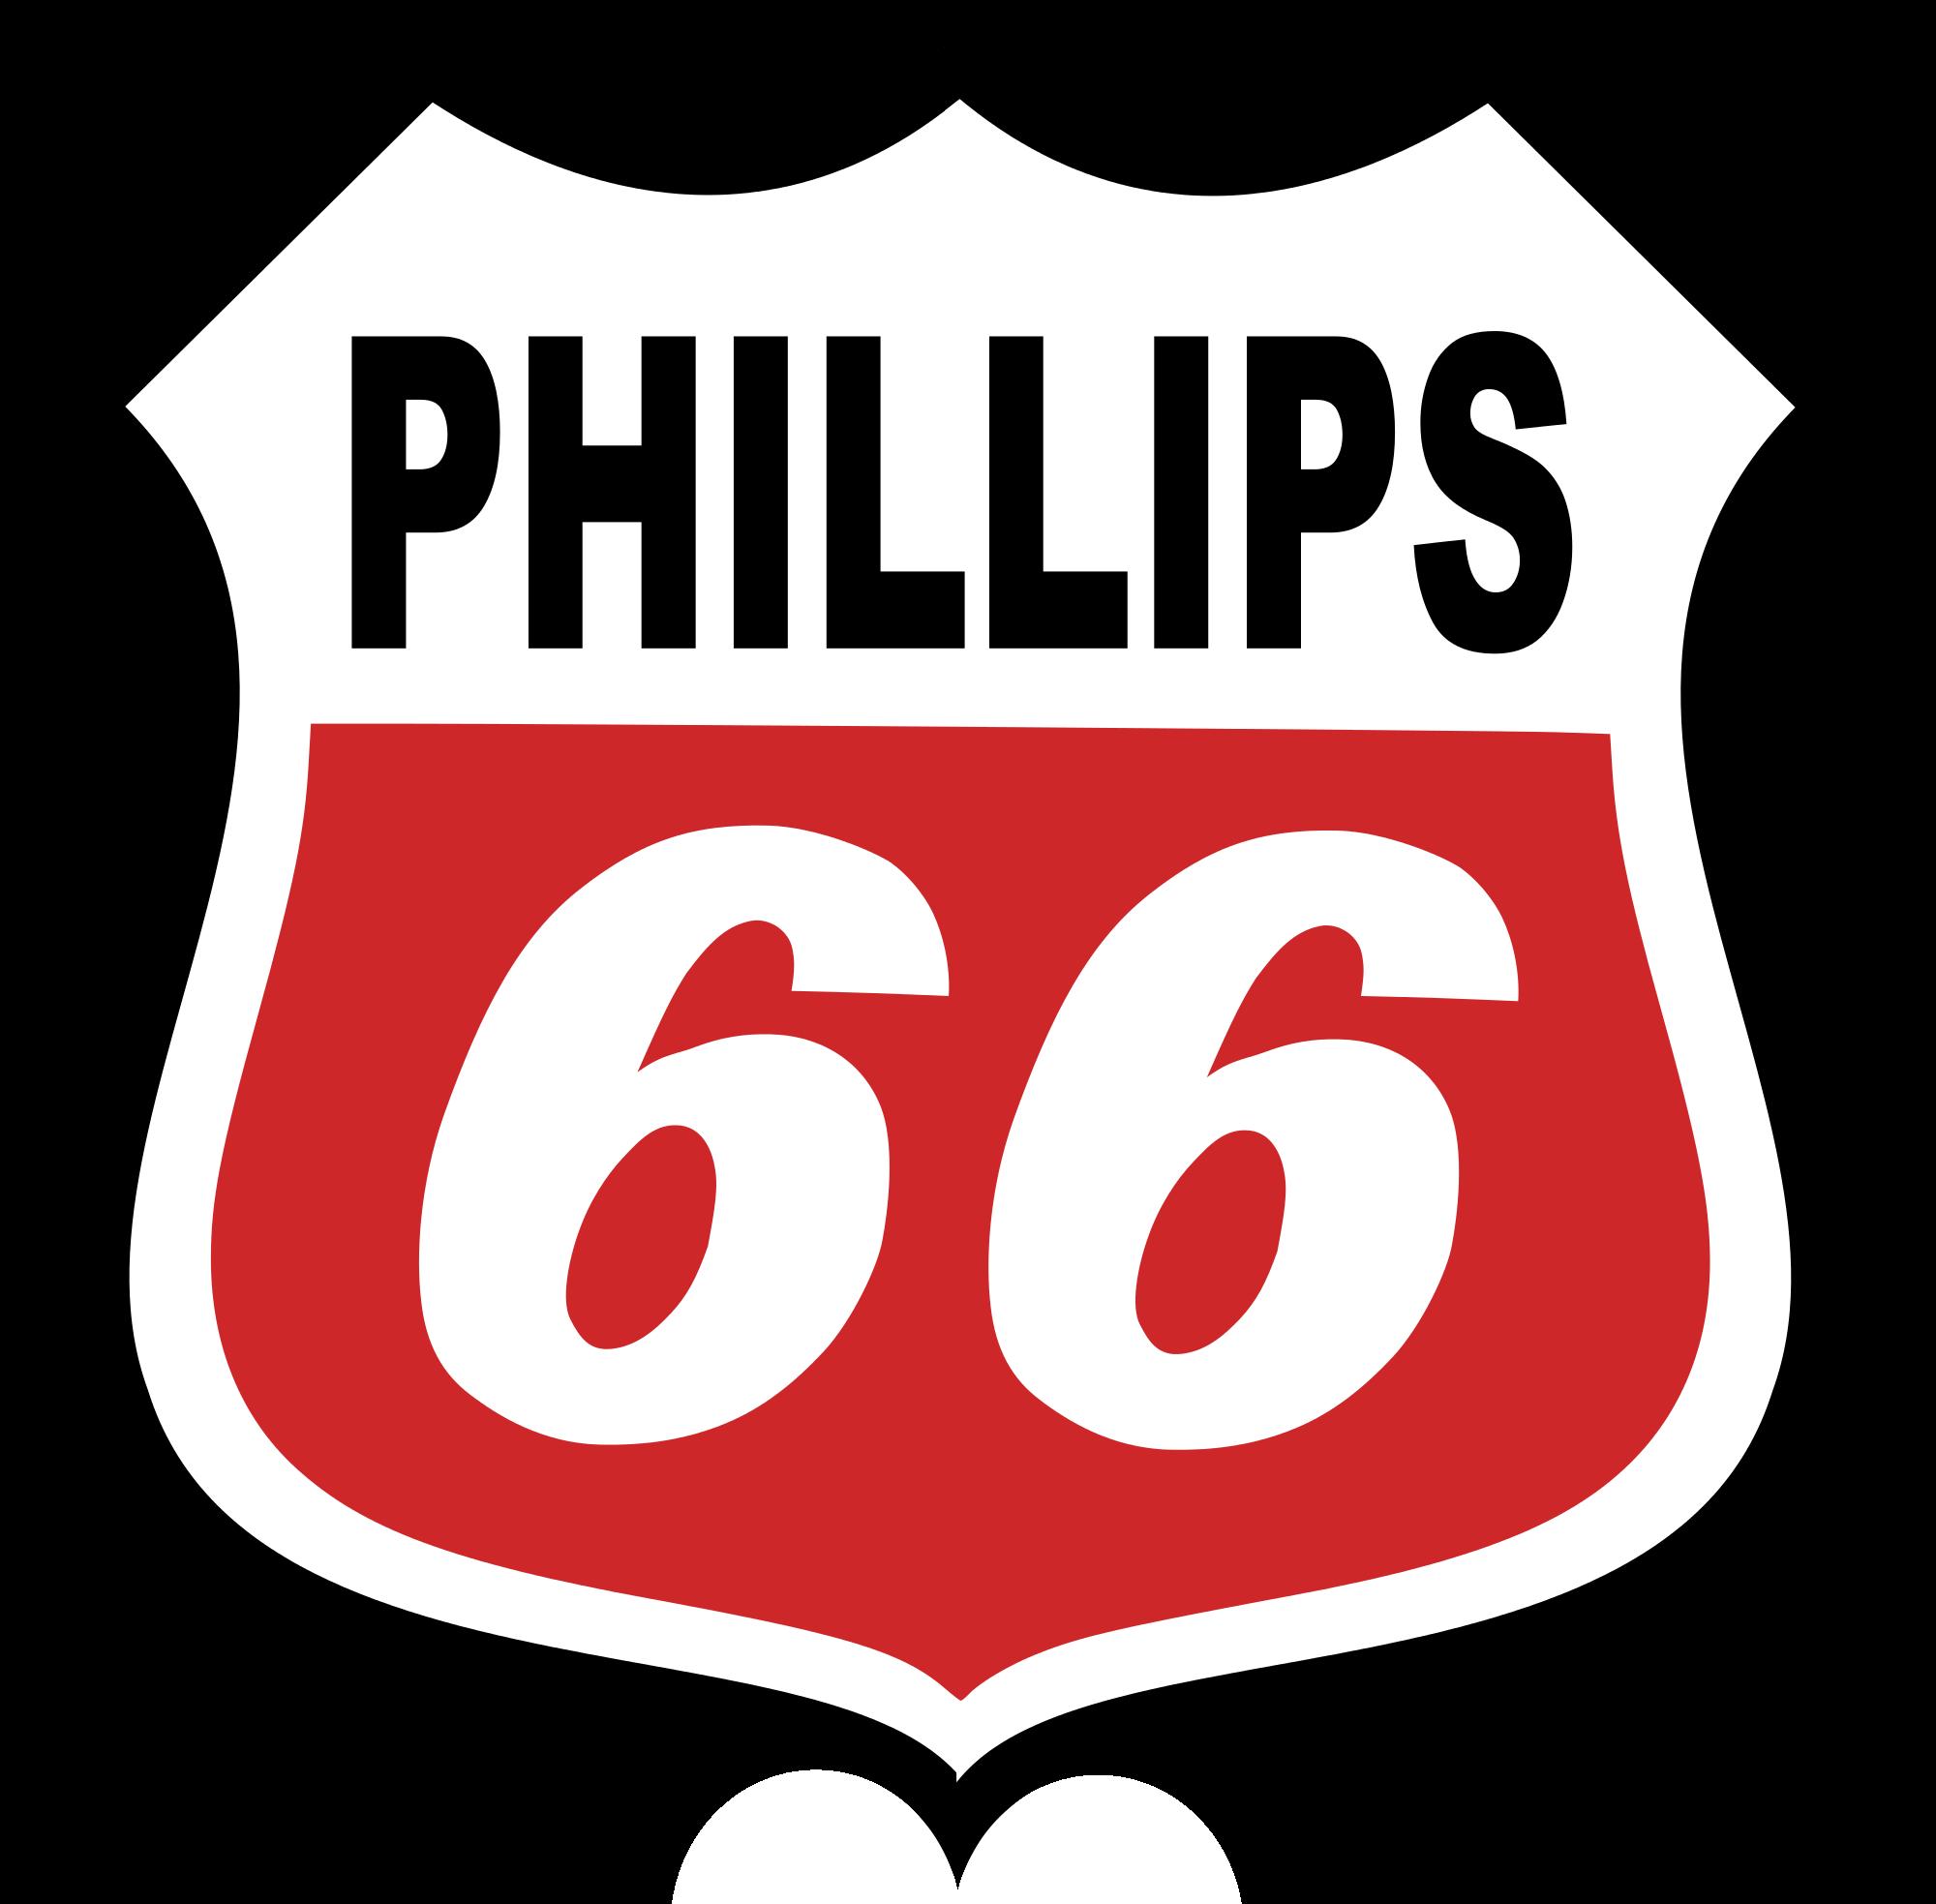 Phillips 66 Philgear Industrial Lube 320 Cross Ref